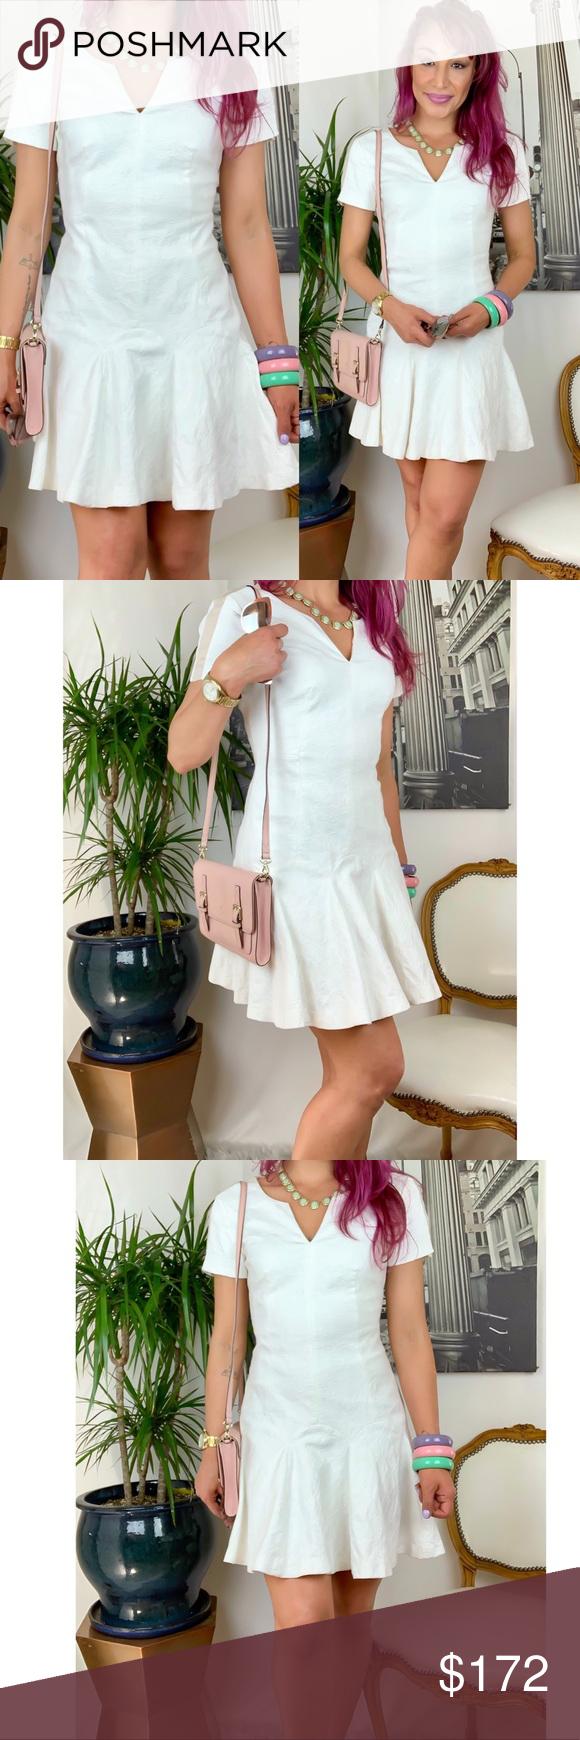 Rebecca Taylor Textured White Tulip Dress Little White Dresses Dresses Tulip Dress [ 1740 x 580 Pixel ]